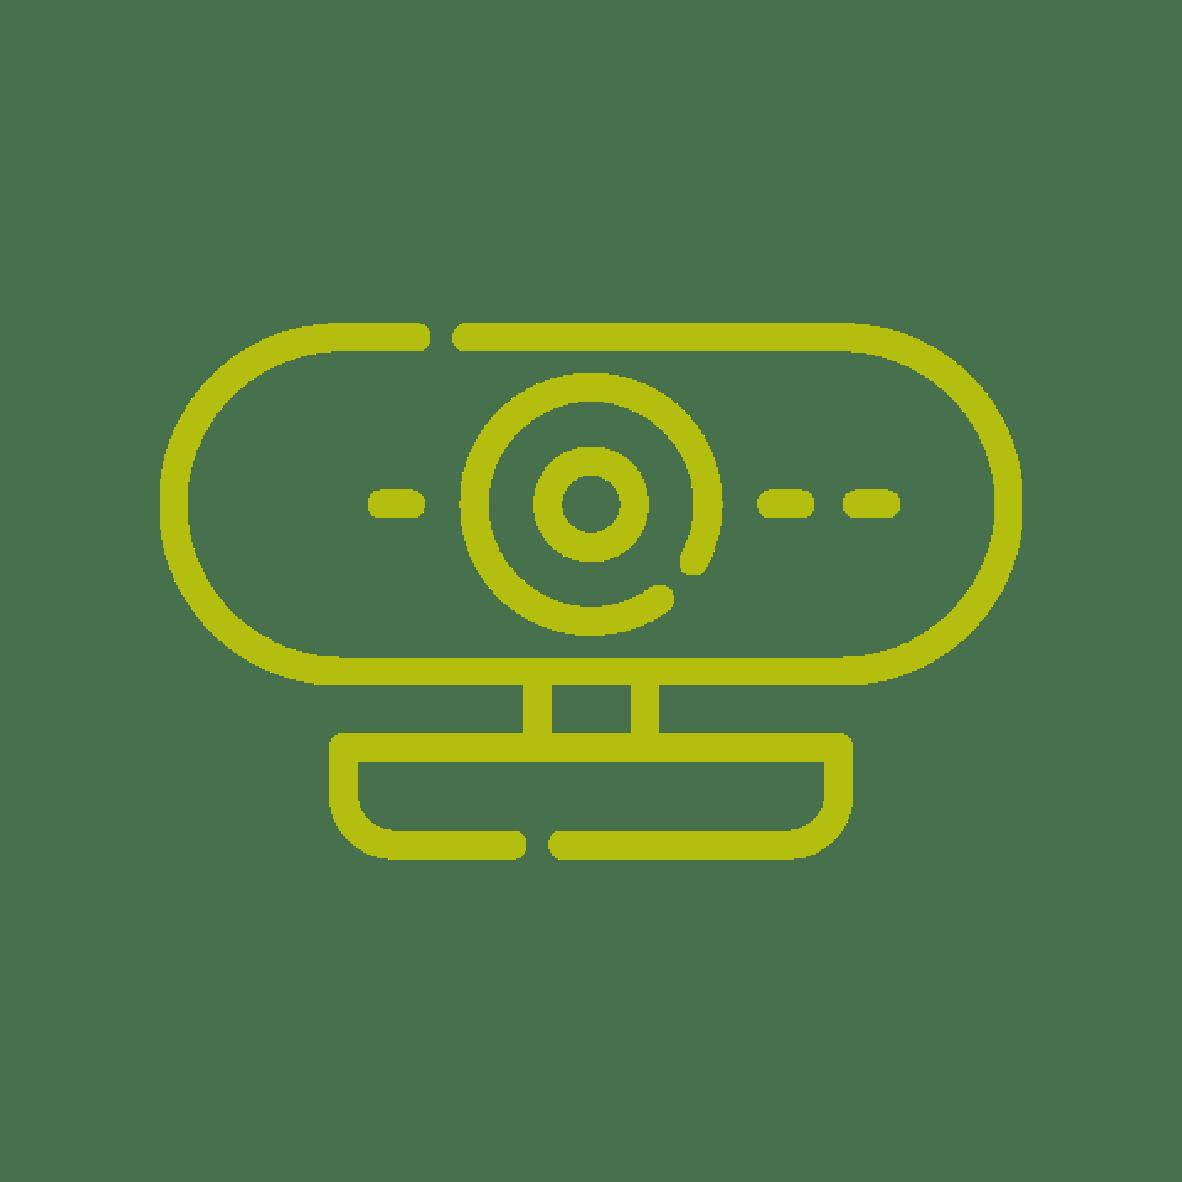 telemedicine green